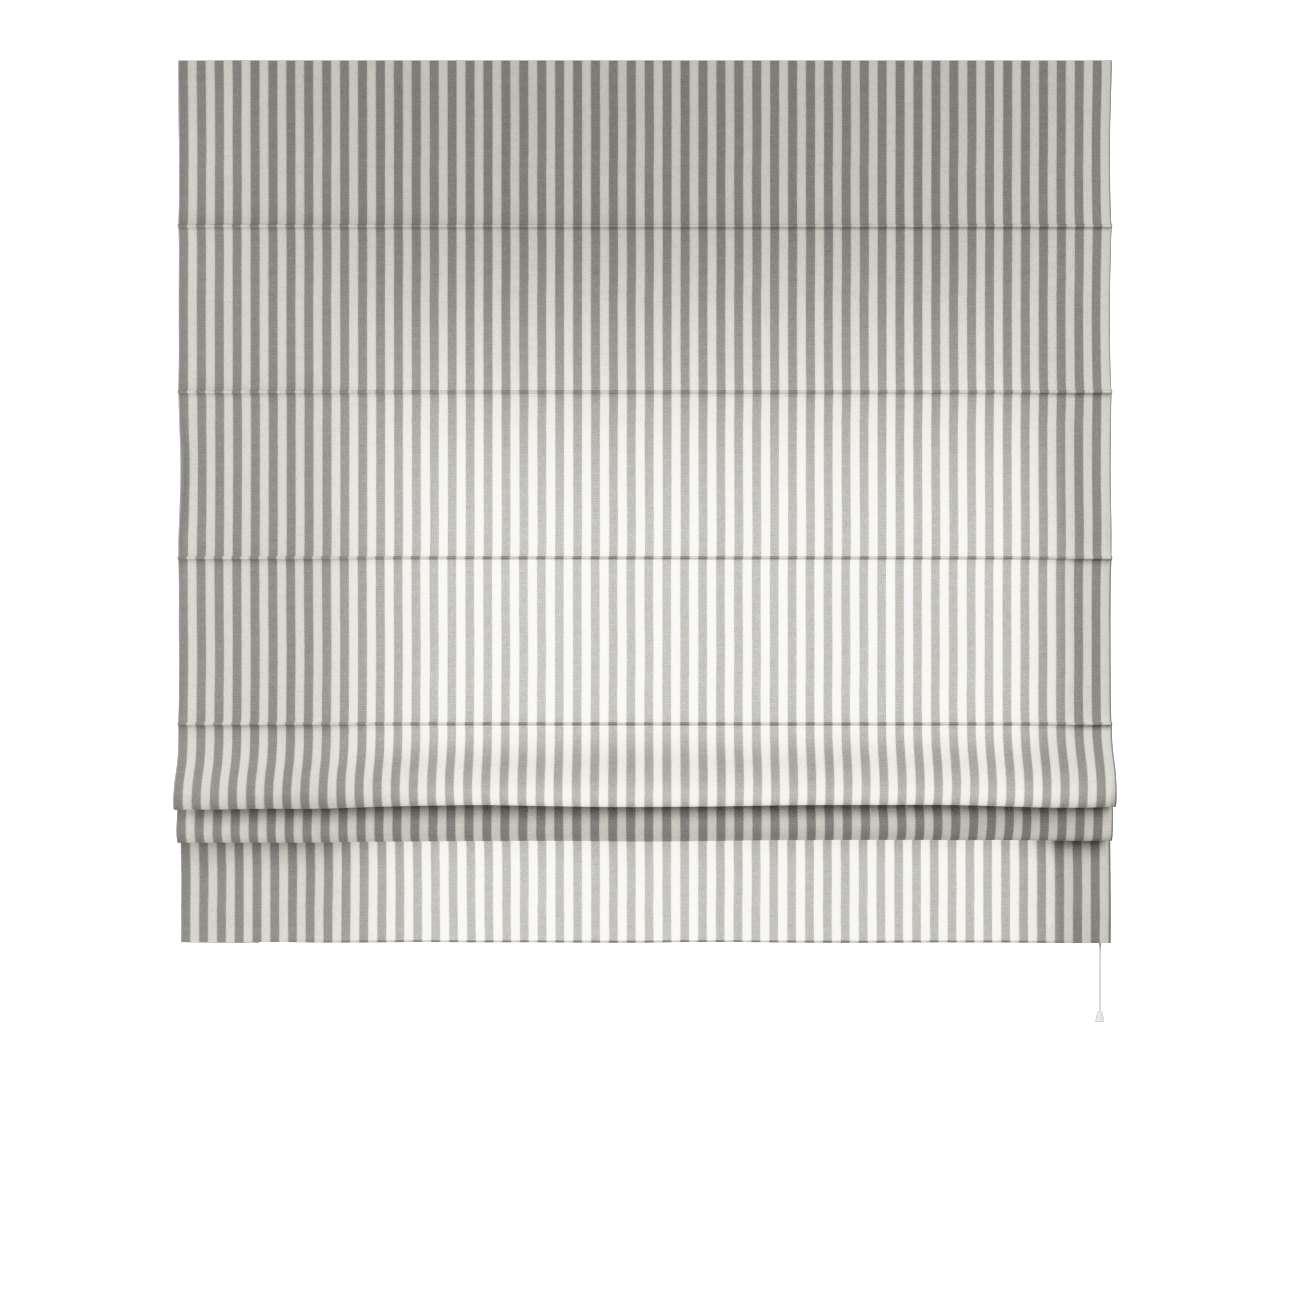 Padva roman blind  in collection Quadro, fabric: 136-12